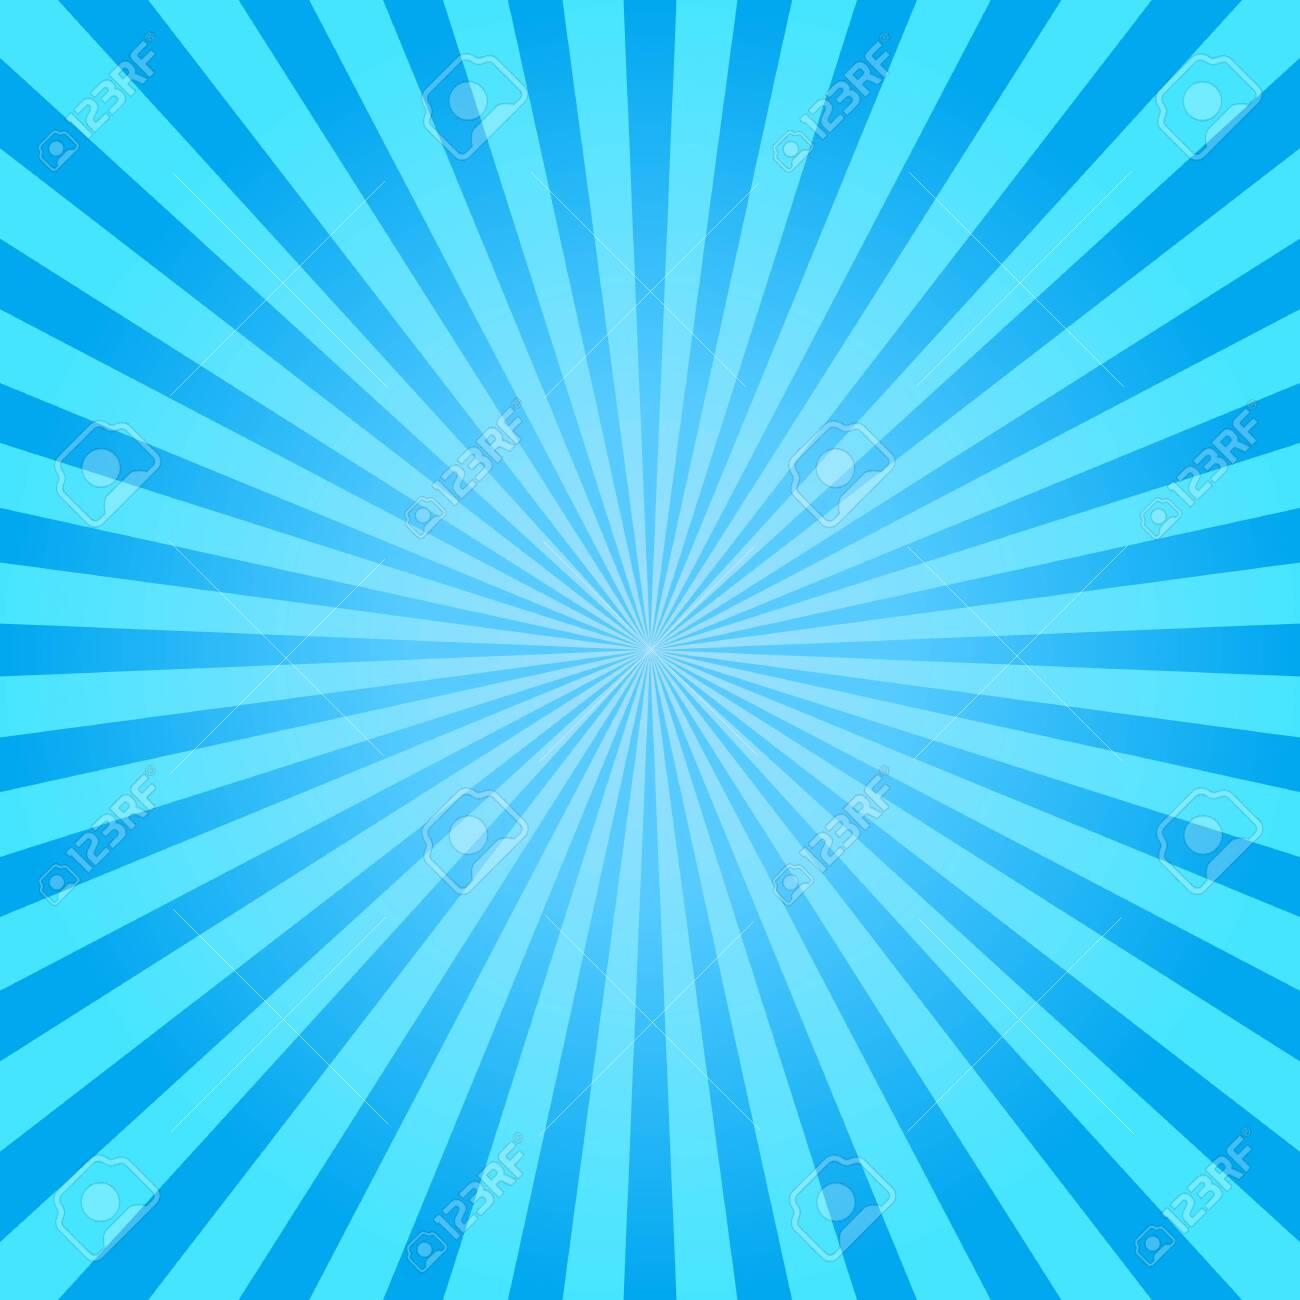 Blue striped background vector illustration - 150297882